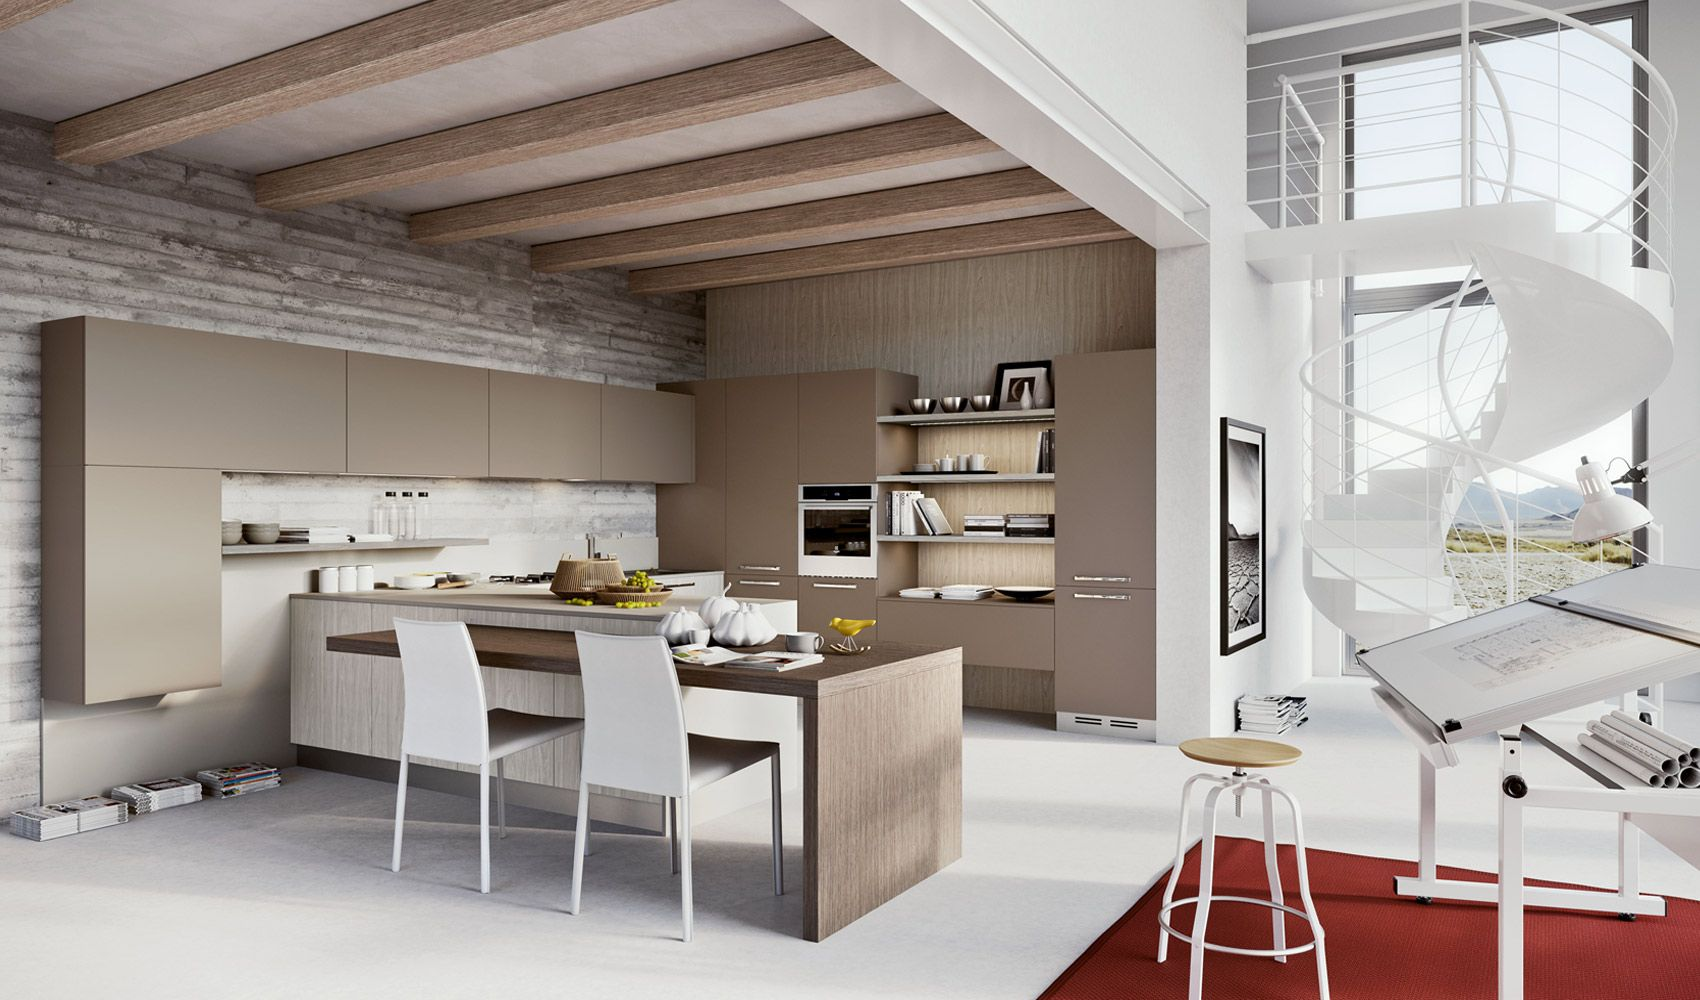 Arredo3 Luna Tall And Wall Units In A Tobacco Colour And Floor Units In White Holm Oak Modern Kitchen Design Kitchen Remodel Design Interior Design Kitchen